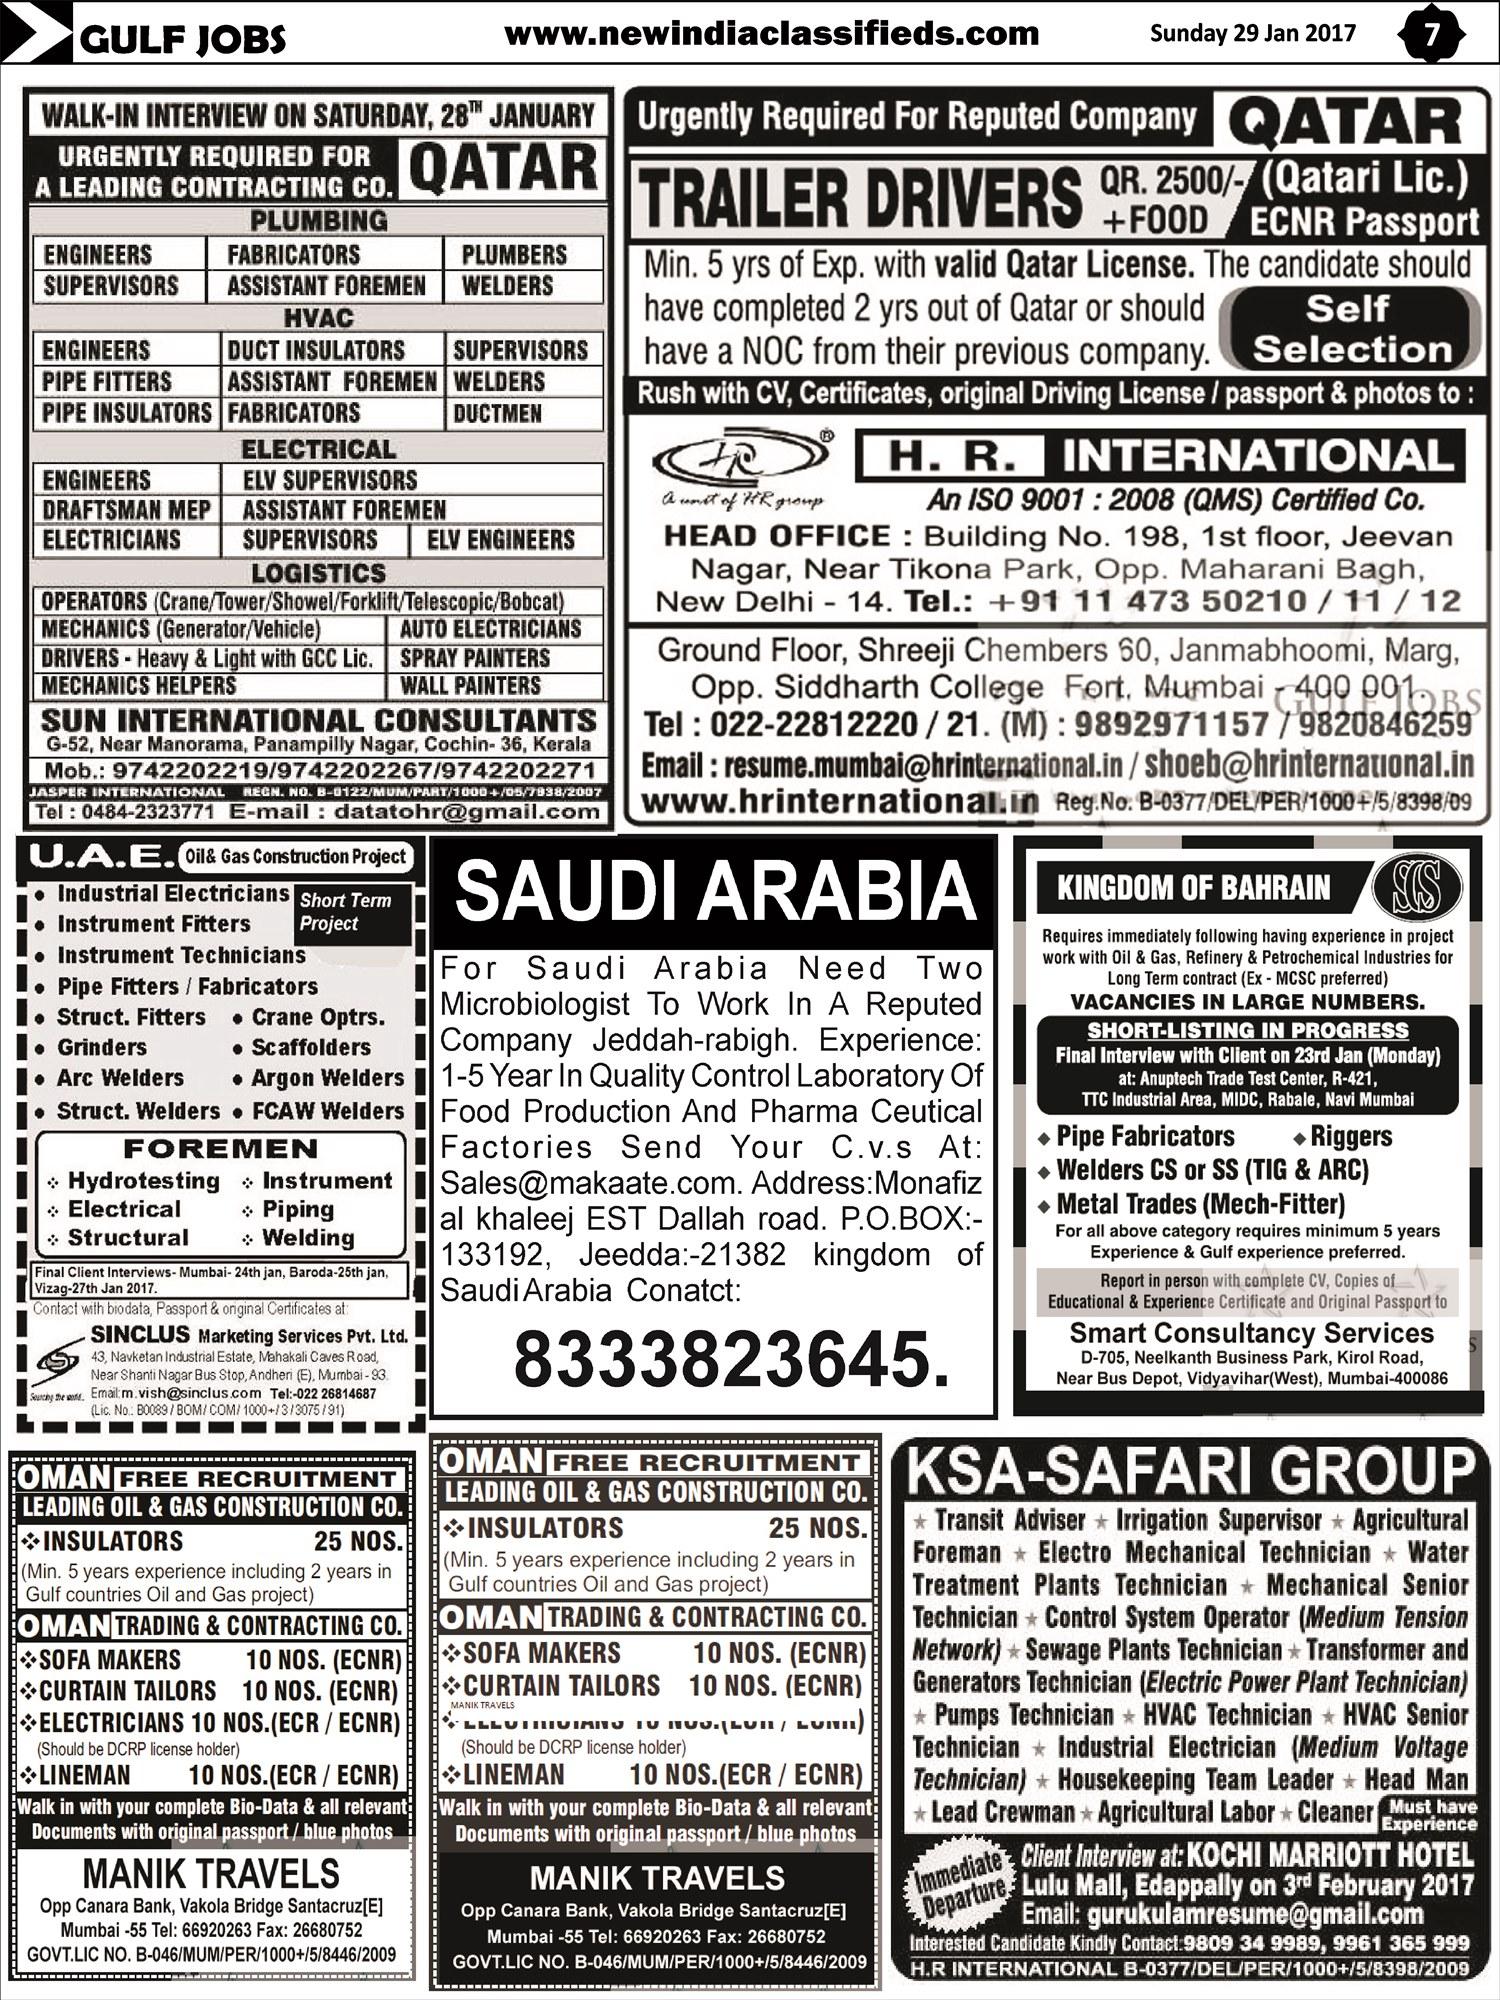 saurachna consultants – ahmedabad